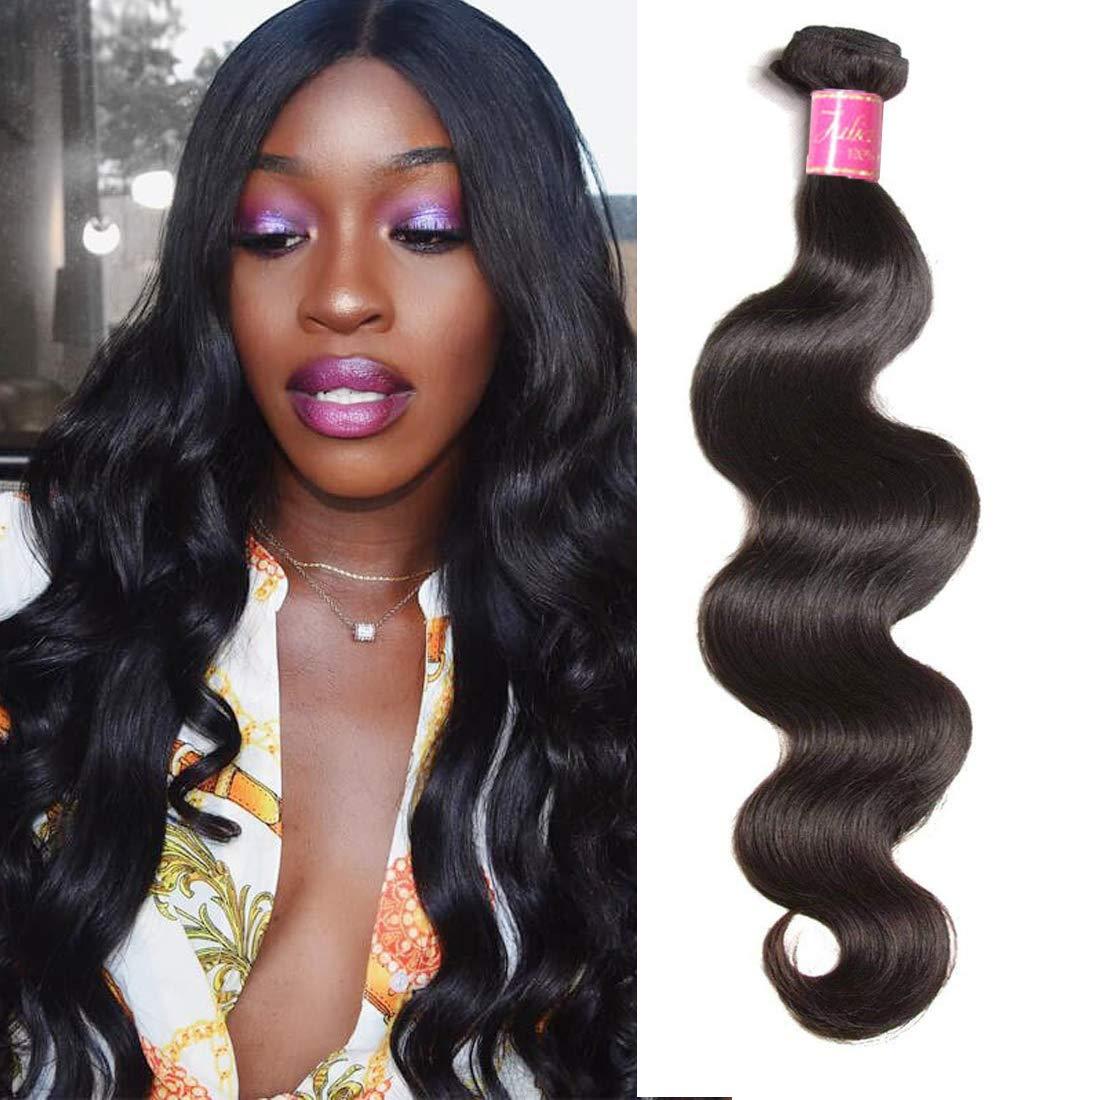 ALI JULIA 2021 new Malaysian Virgin Body Wave Un Weave sold out Bundle 100% 1 Hair